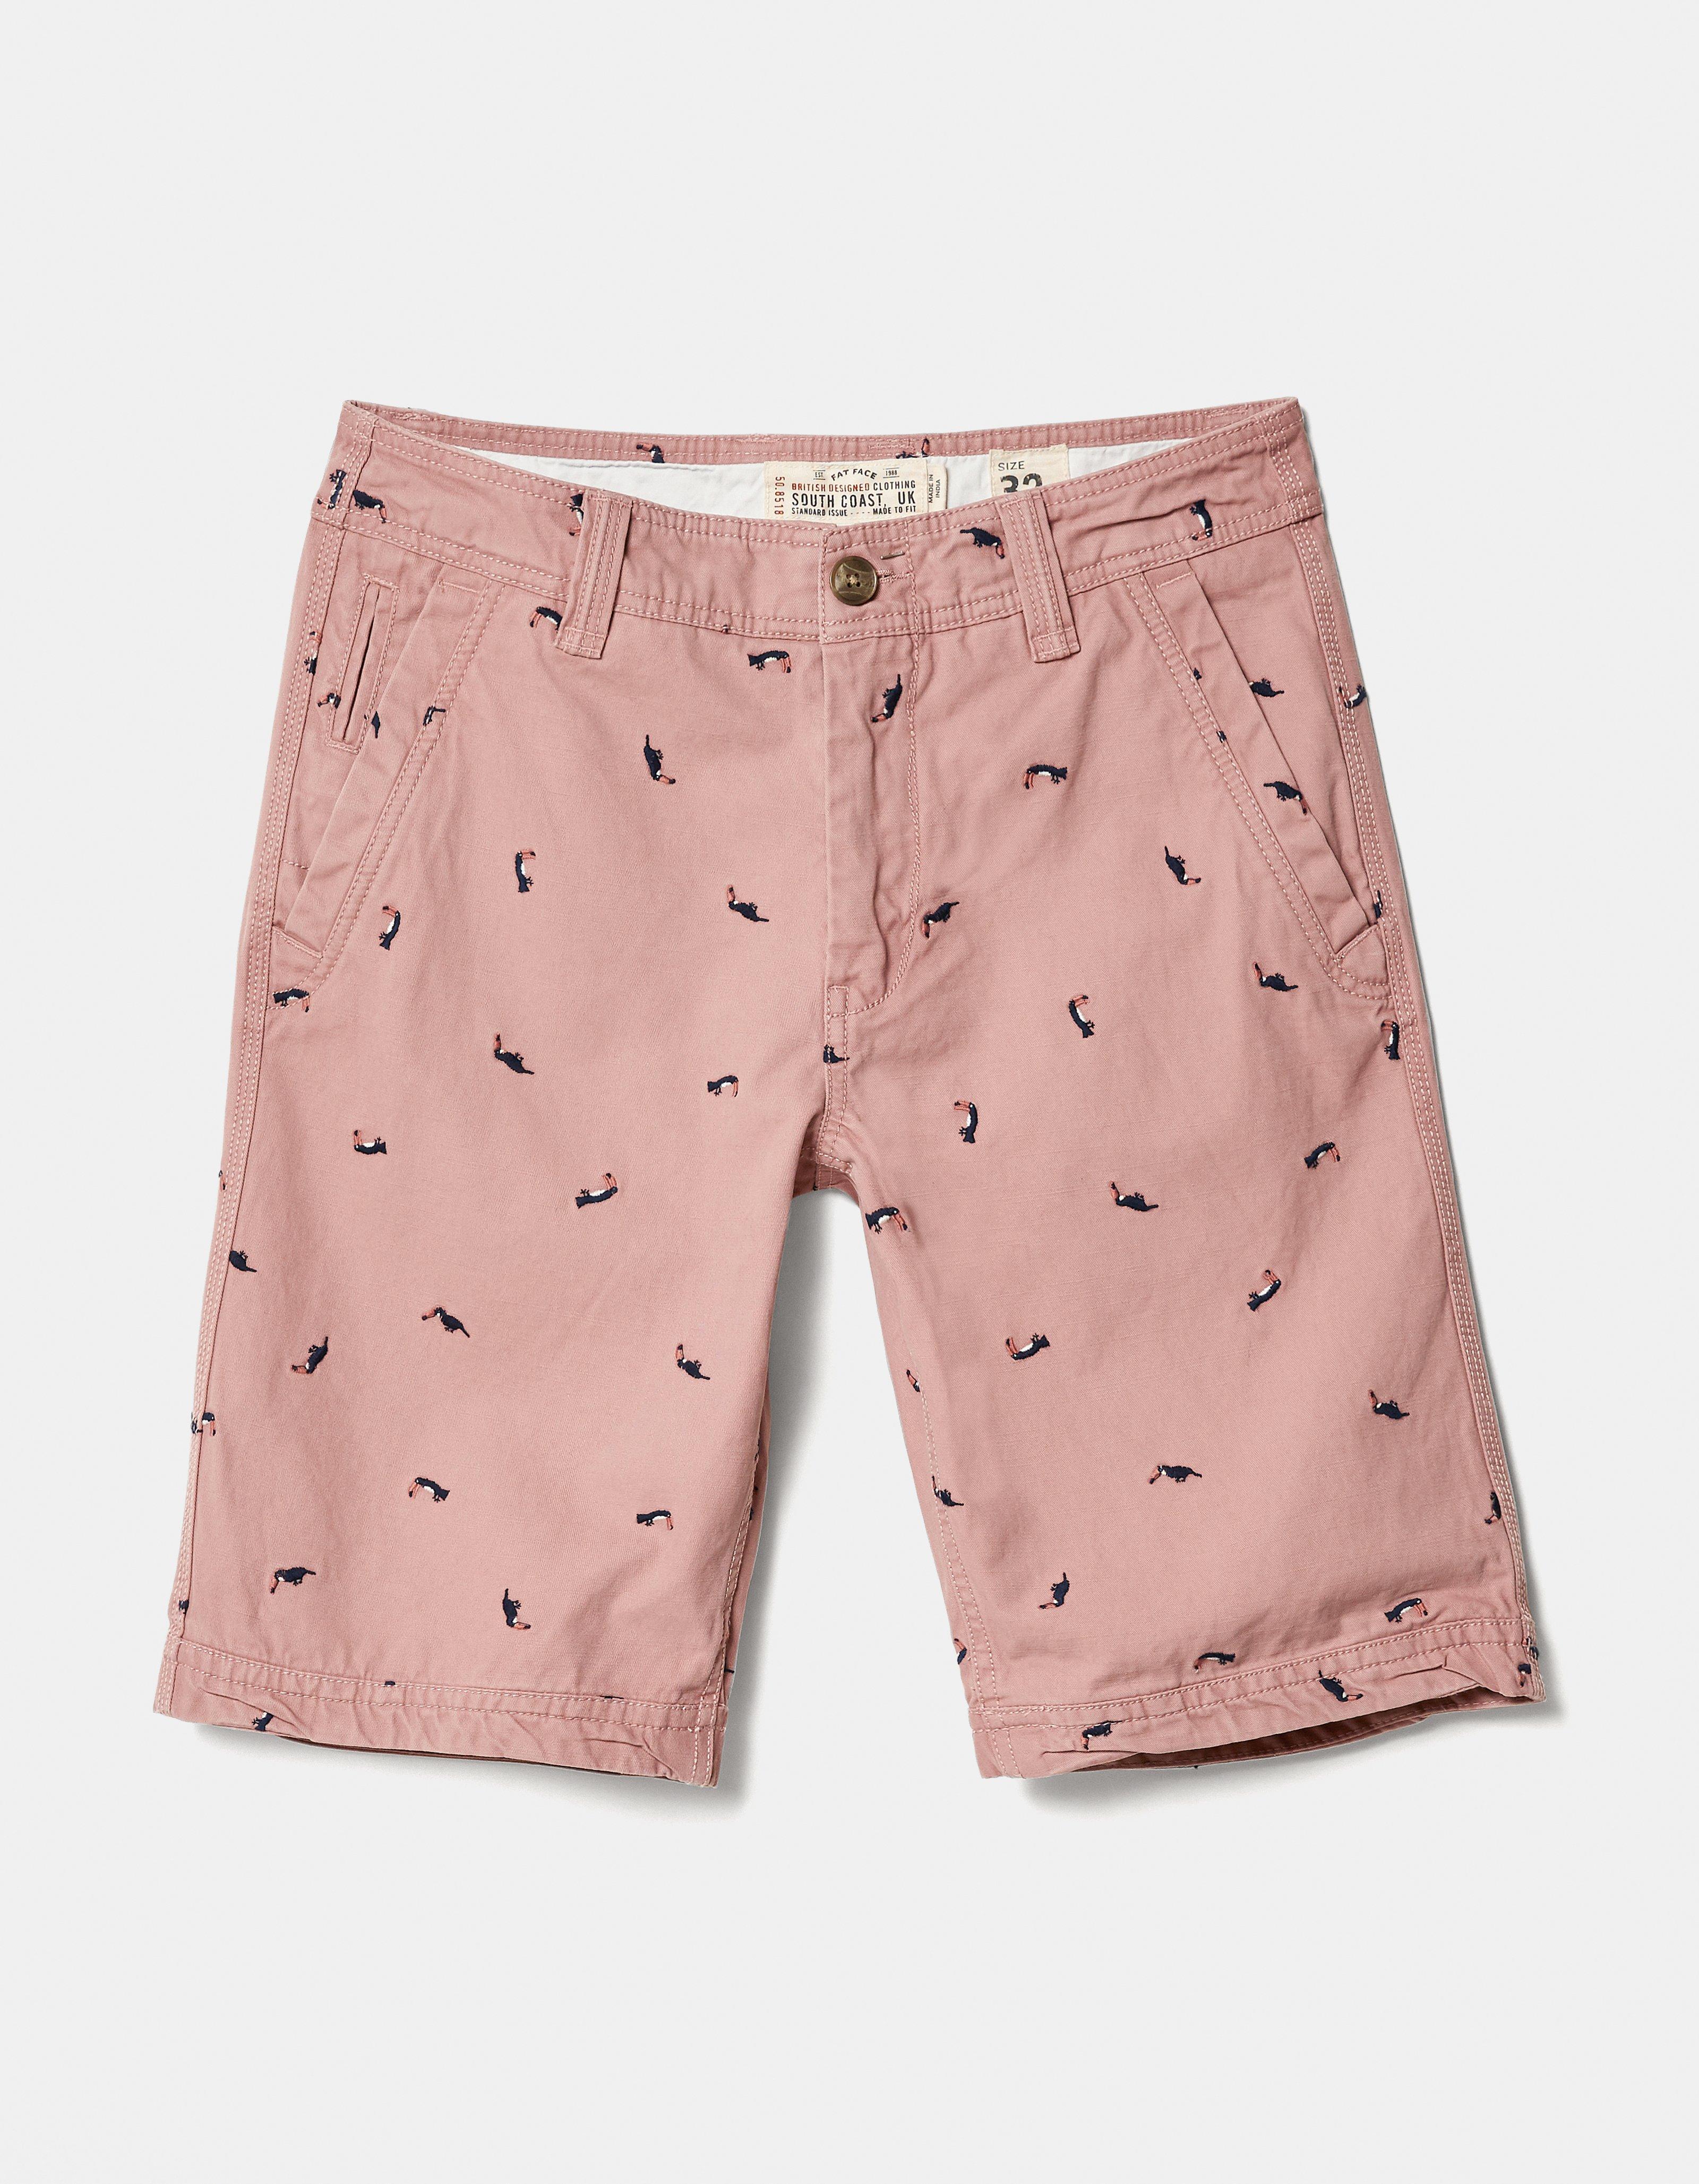 e61dd90a1e Cove Toucan Embroidery Shorts, Shorts | FatFace.com